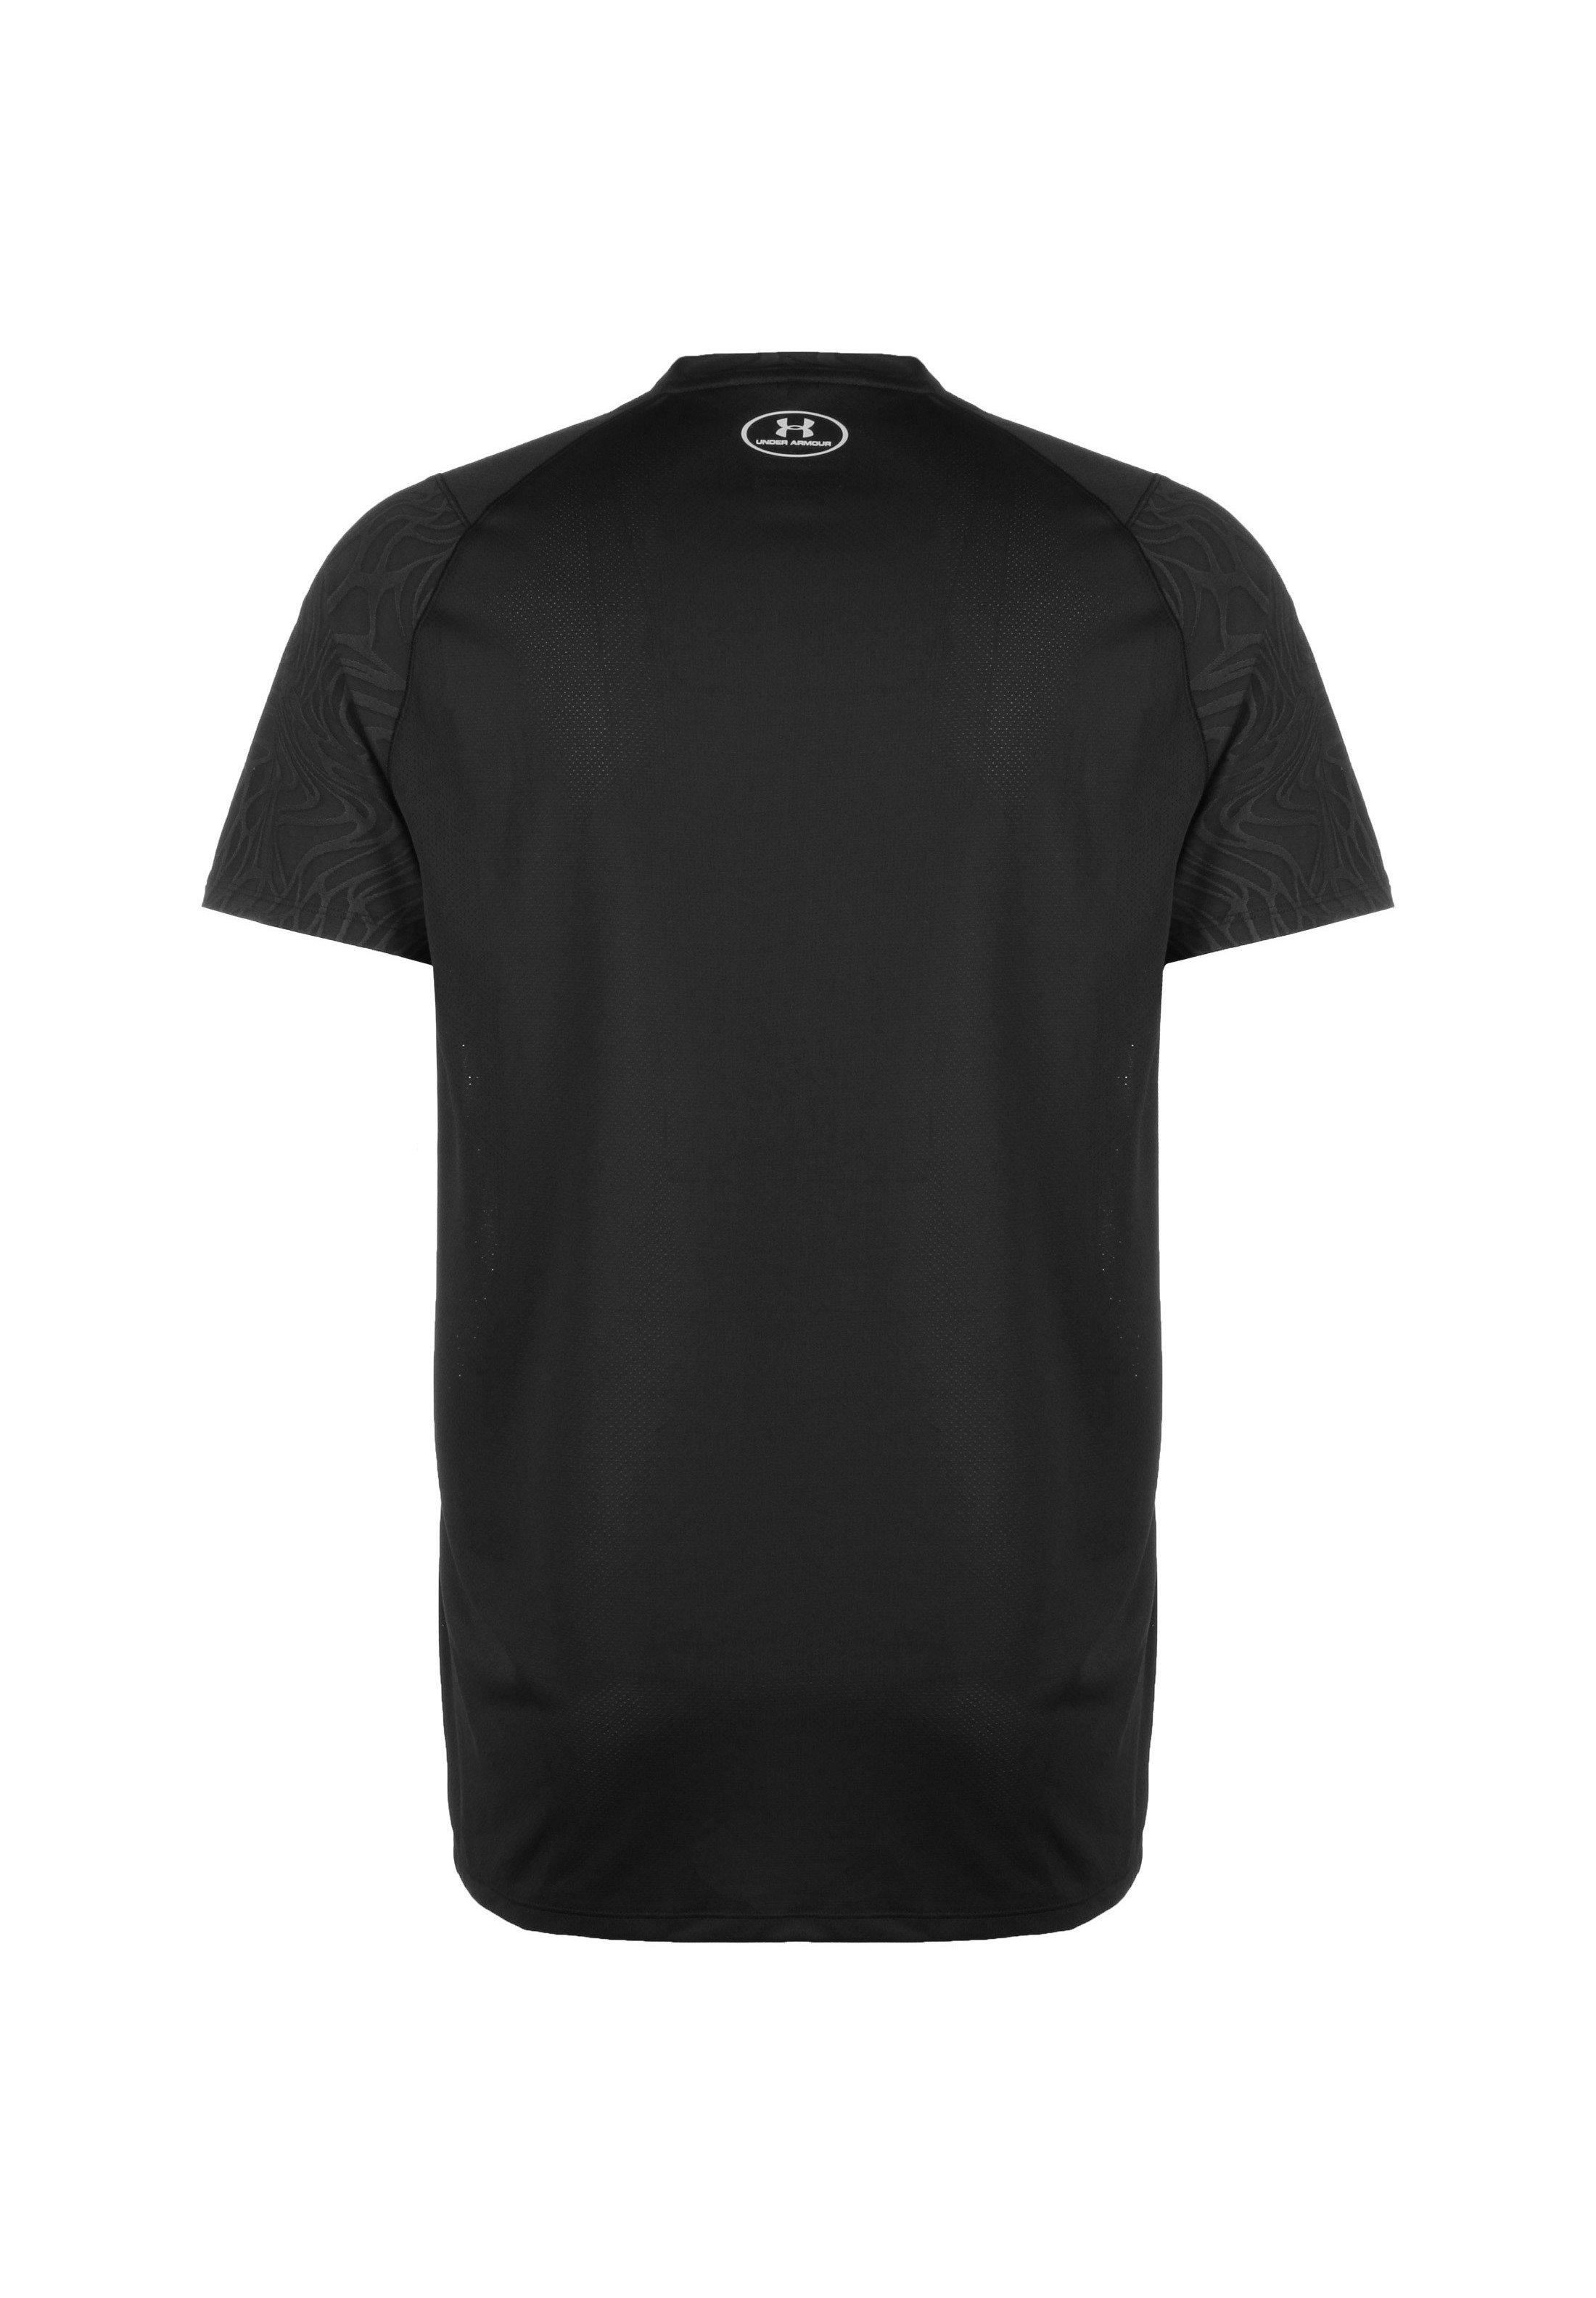 Under Armour Mk-1 Trainingsshirt Damen - Basic T-shirt Black